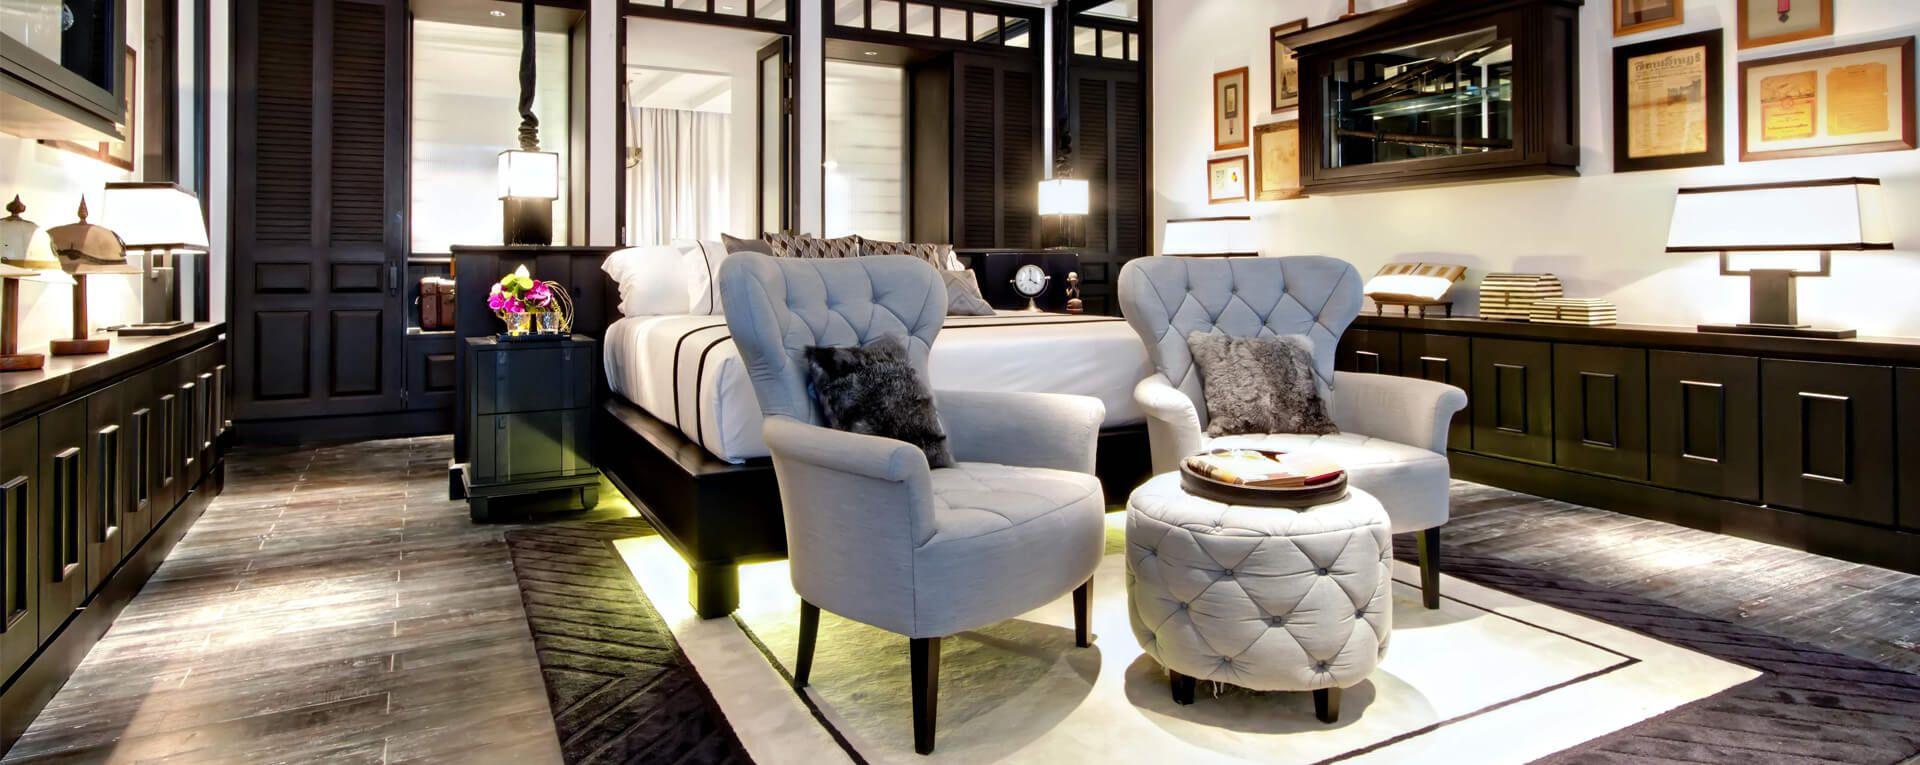 The Siam Hotel, Bangkok – An Urban Luxury Resort